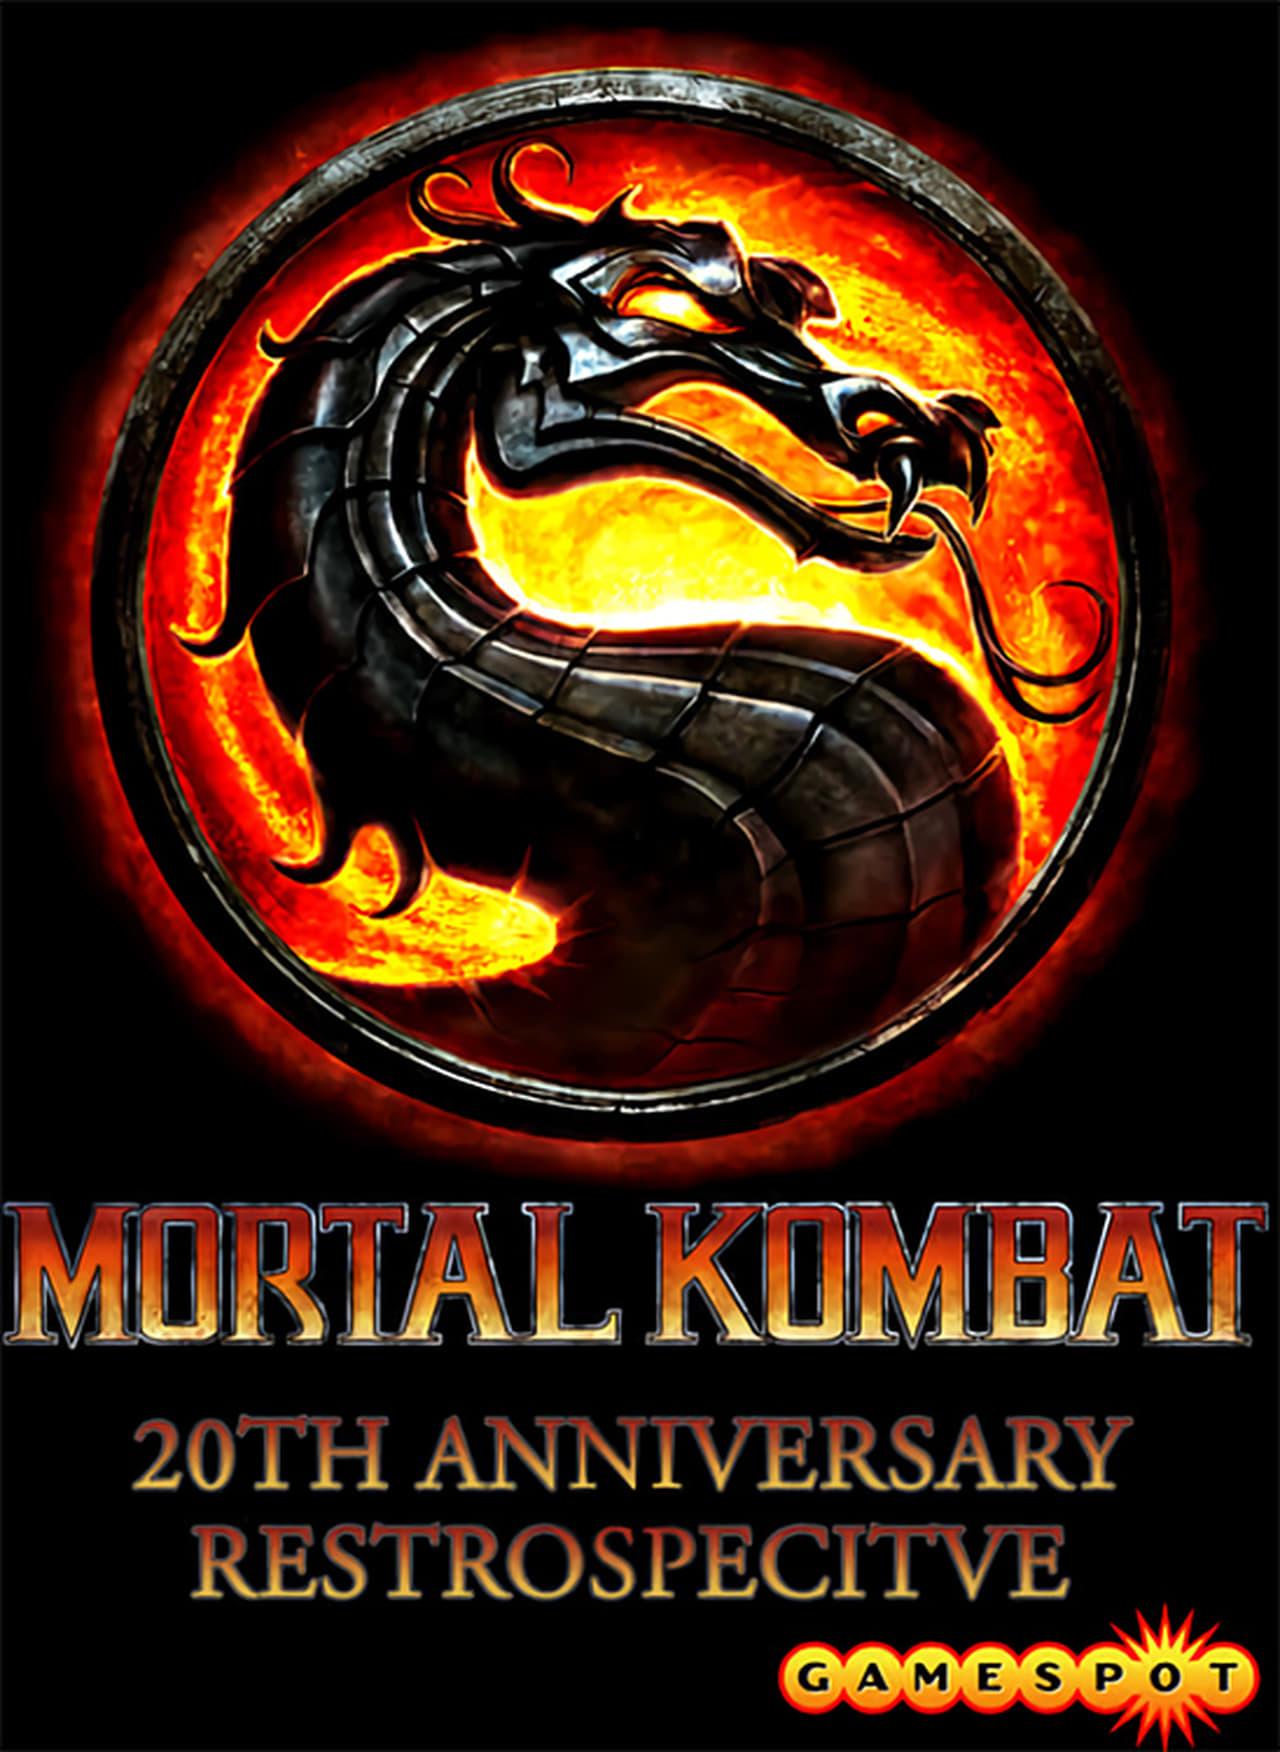 Watch Mortal Kombat 20th Anniversary Retrospective (2012) Full Movie Online Free at britsineurope.org